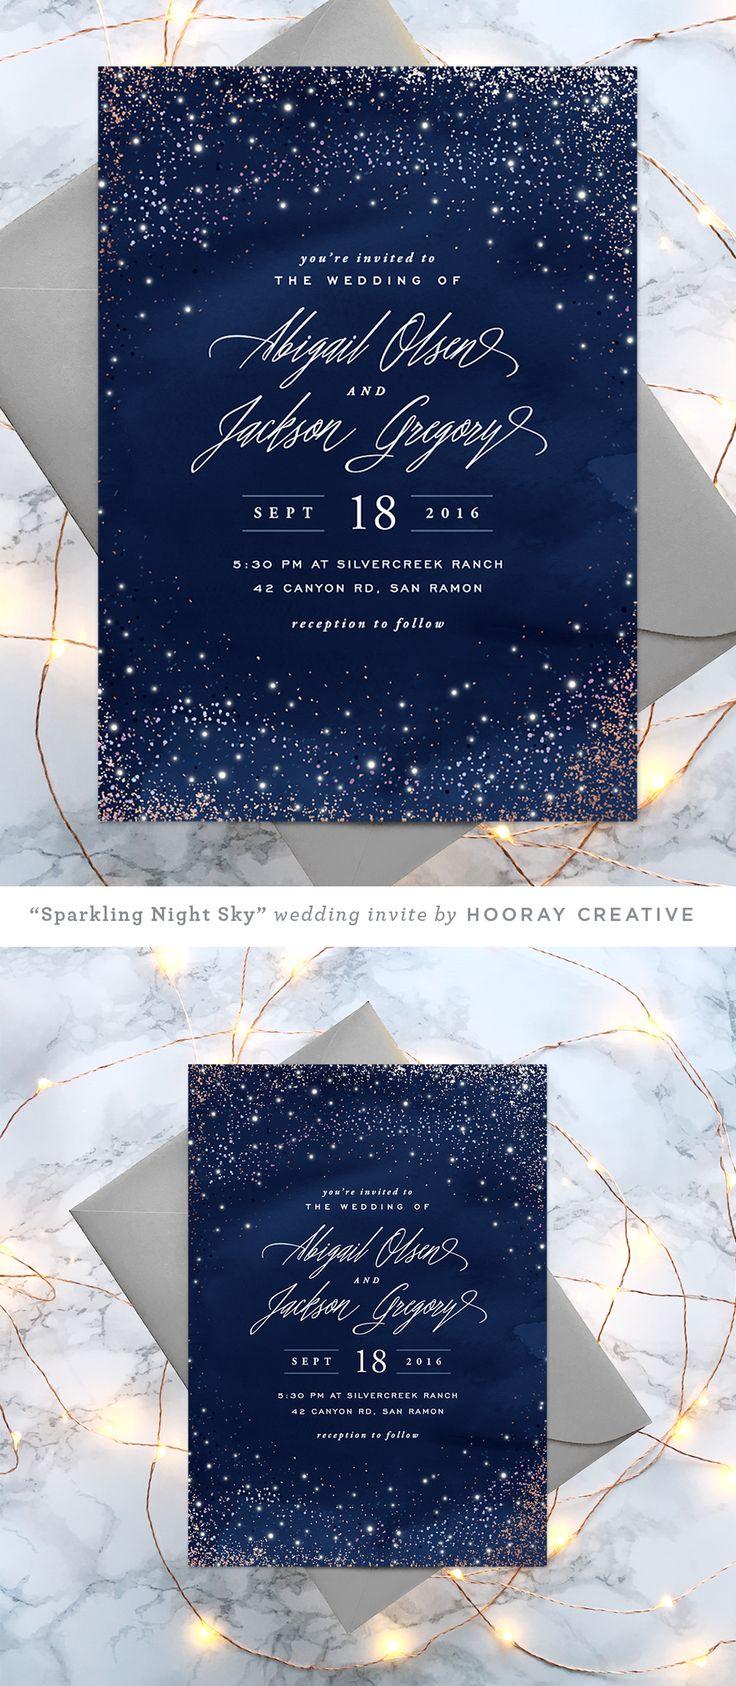 wedding invitation design wedding invitations design Sparkling Night Sky starry wedding invitation design and styling by Hooray Creative